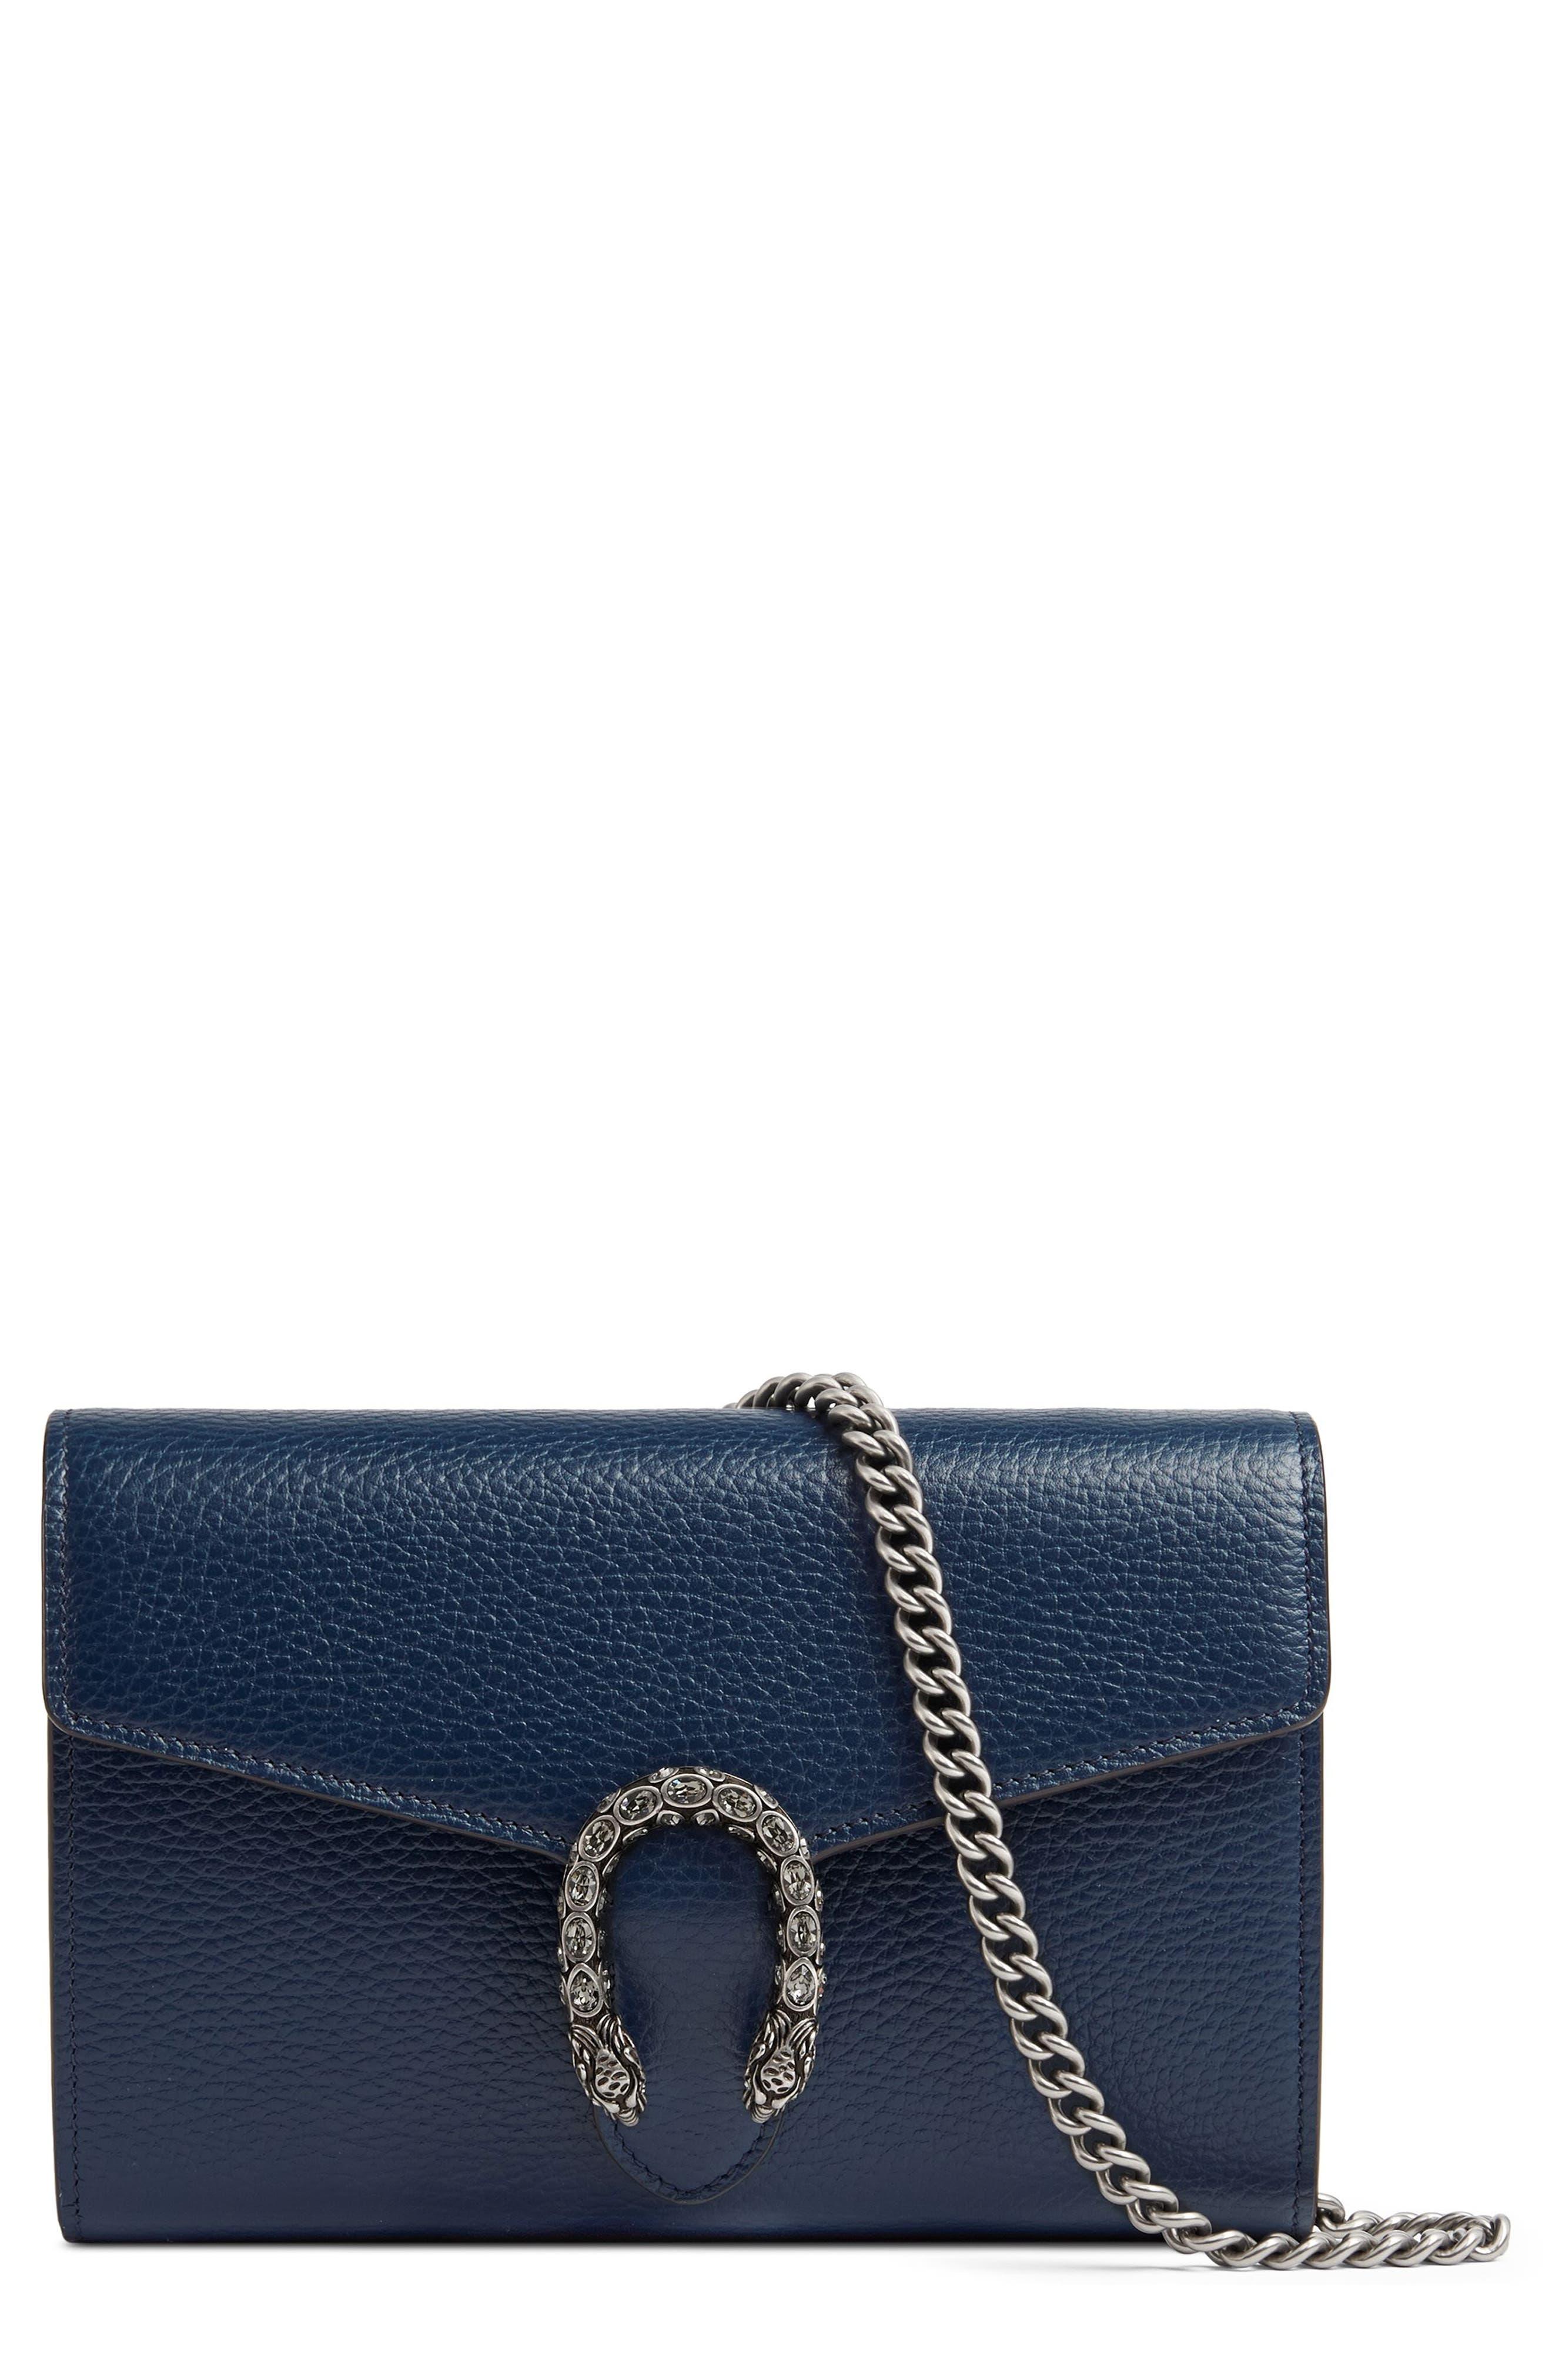 Dionysus Leather Wallet on a Chain,                         Main,                         color, BLU AGATA/ BLACK DIAMOND